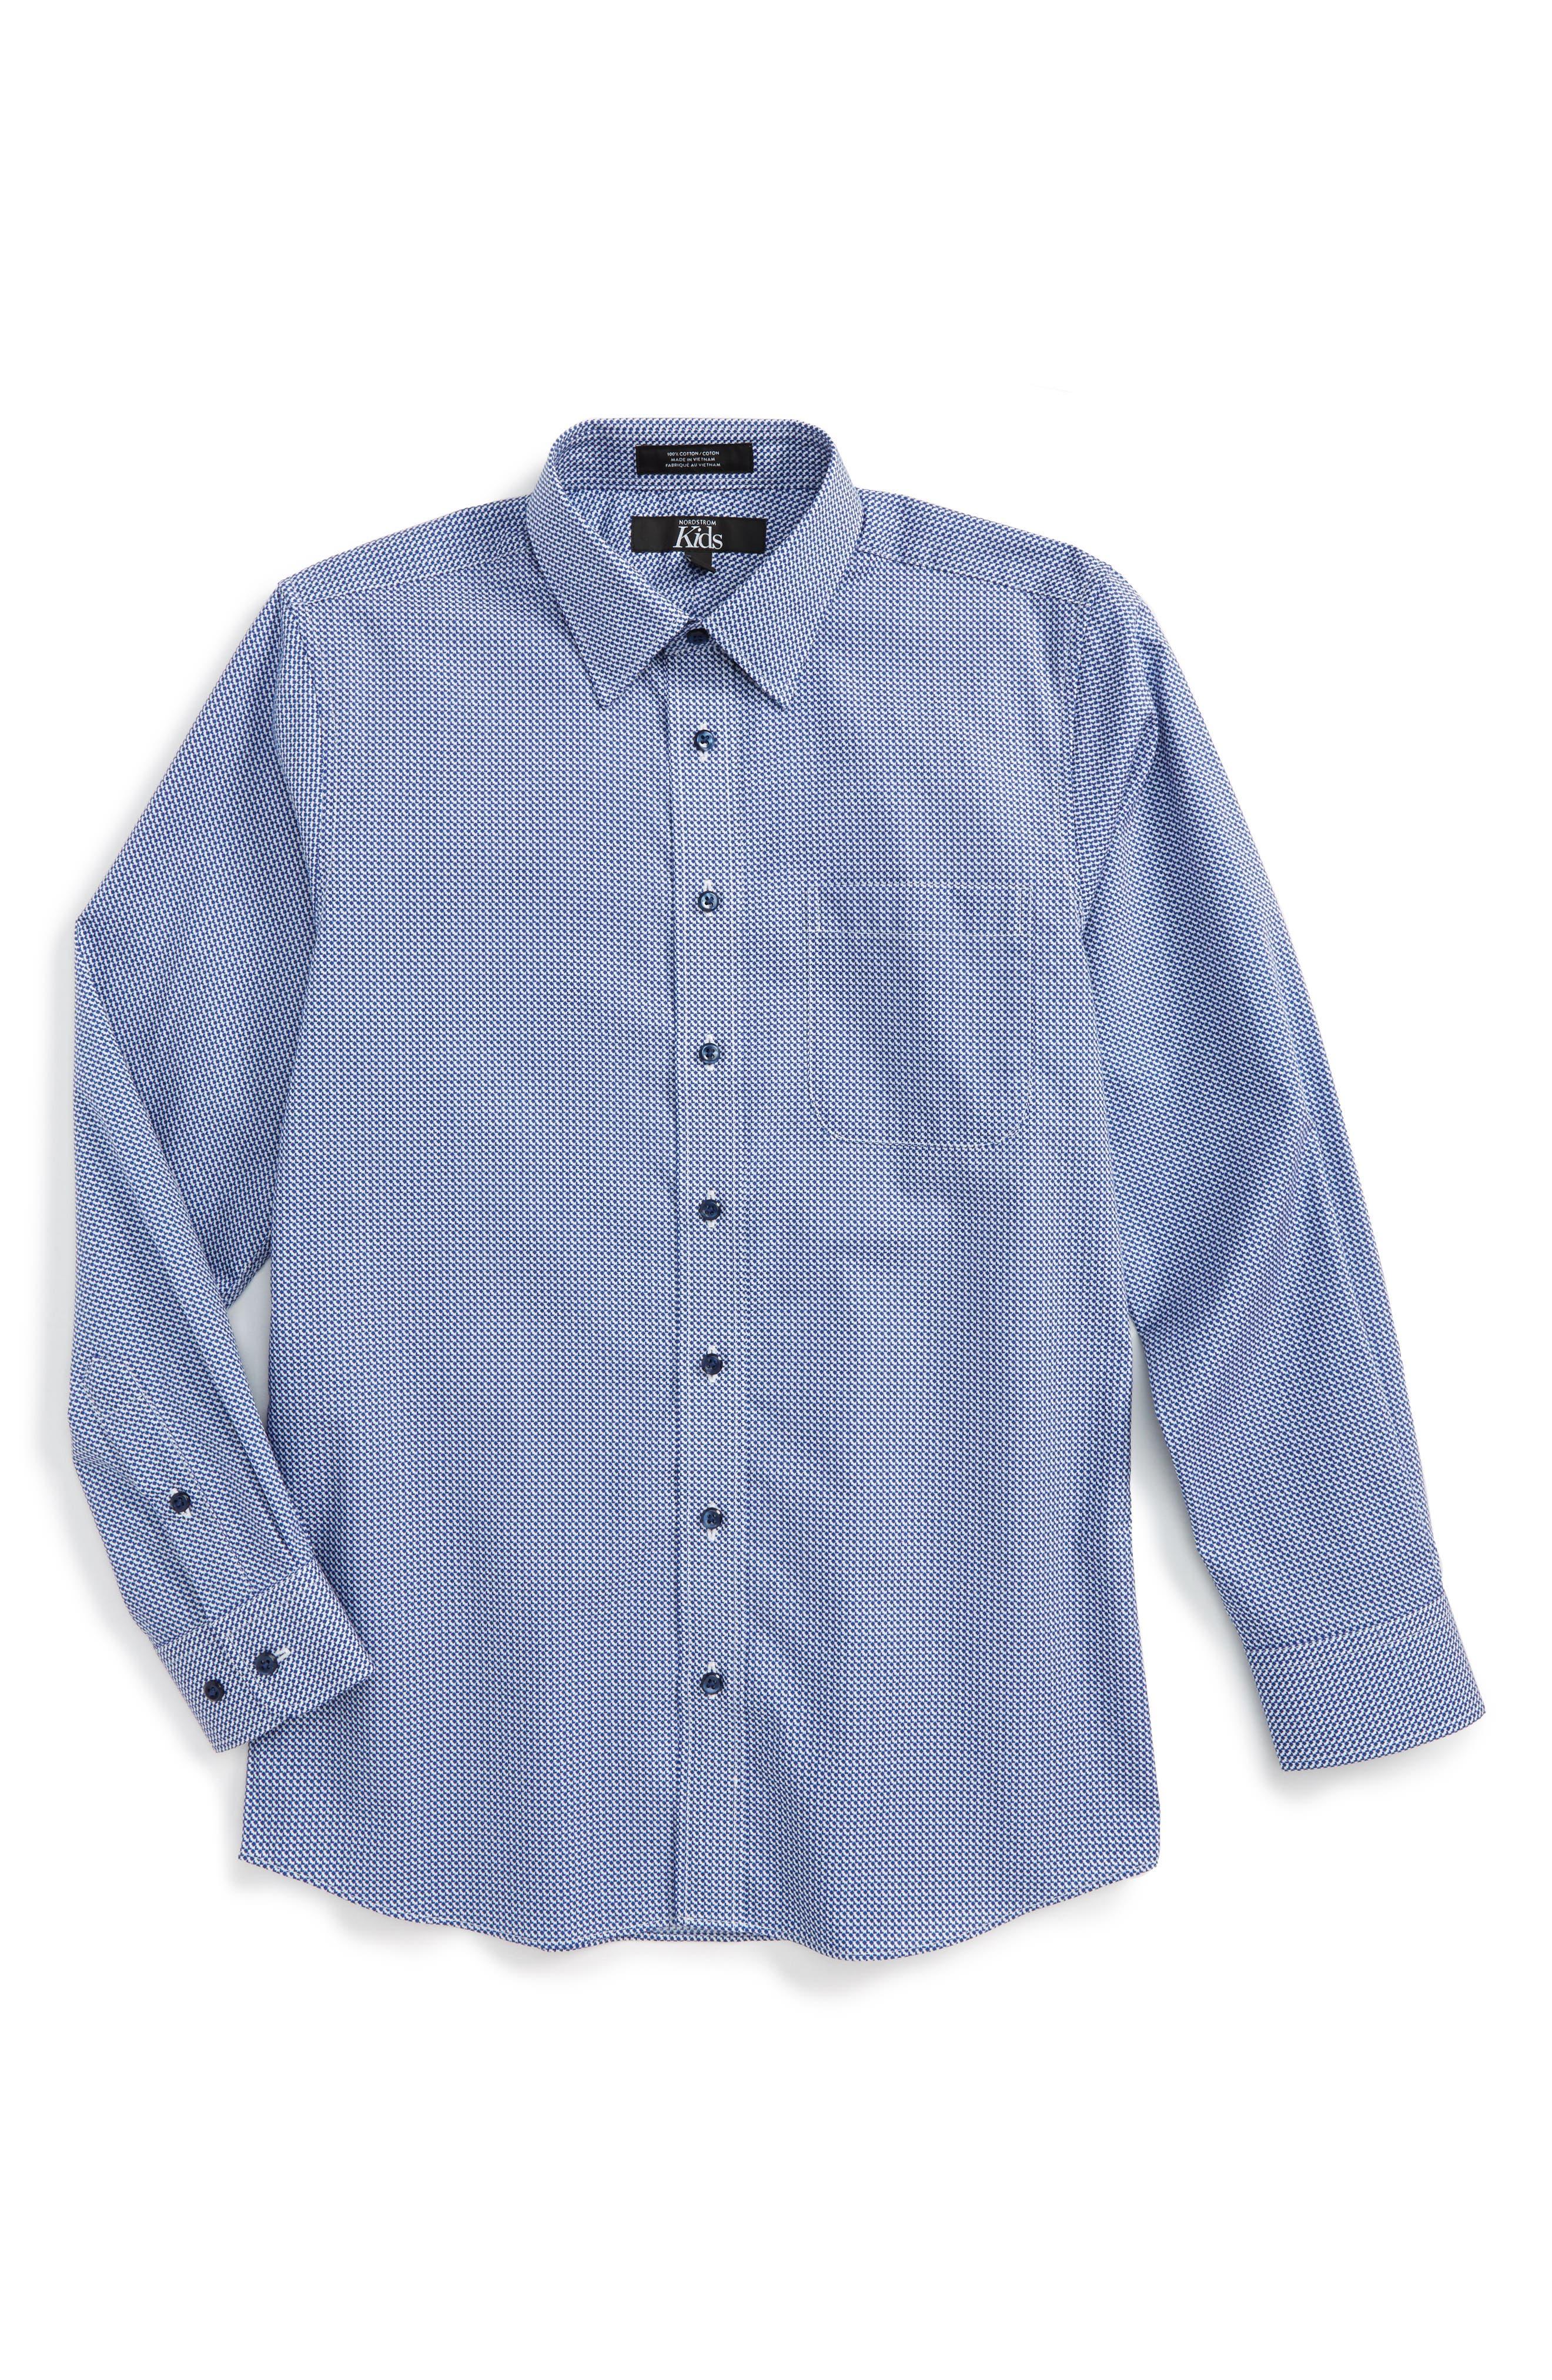 Neat Dress Shirt,                             Main thumbnail 1, color,                             Blue Sodalite Neat